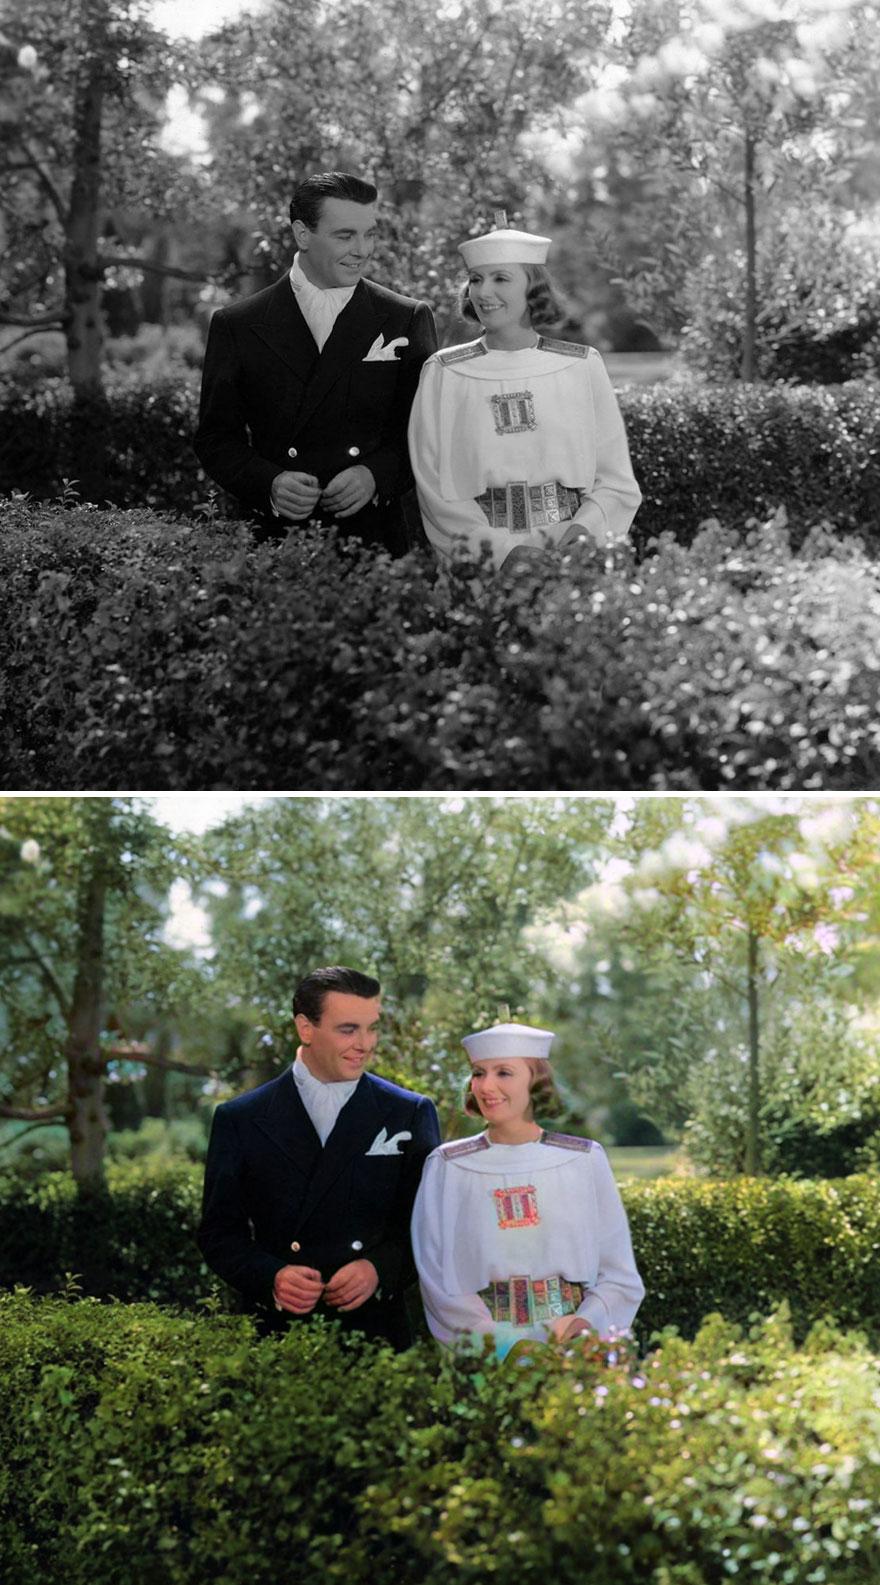 Greta Garbo And George Brent